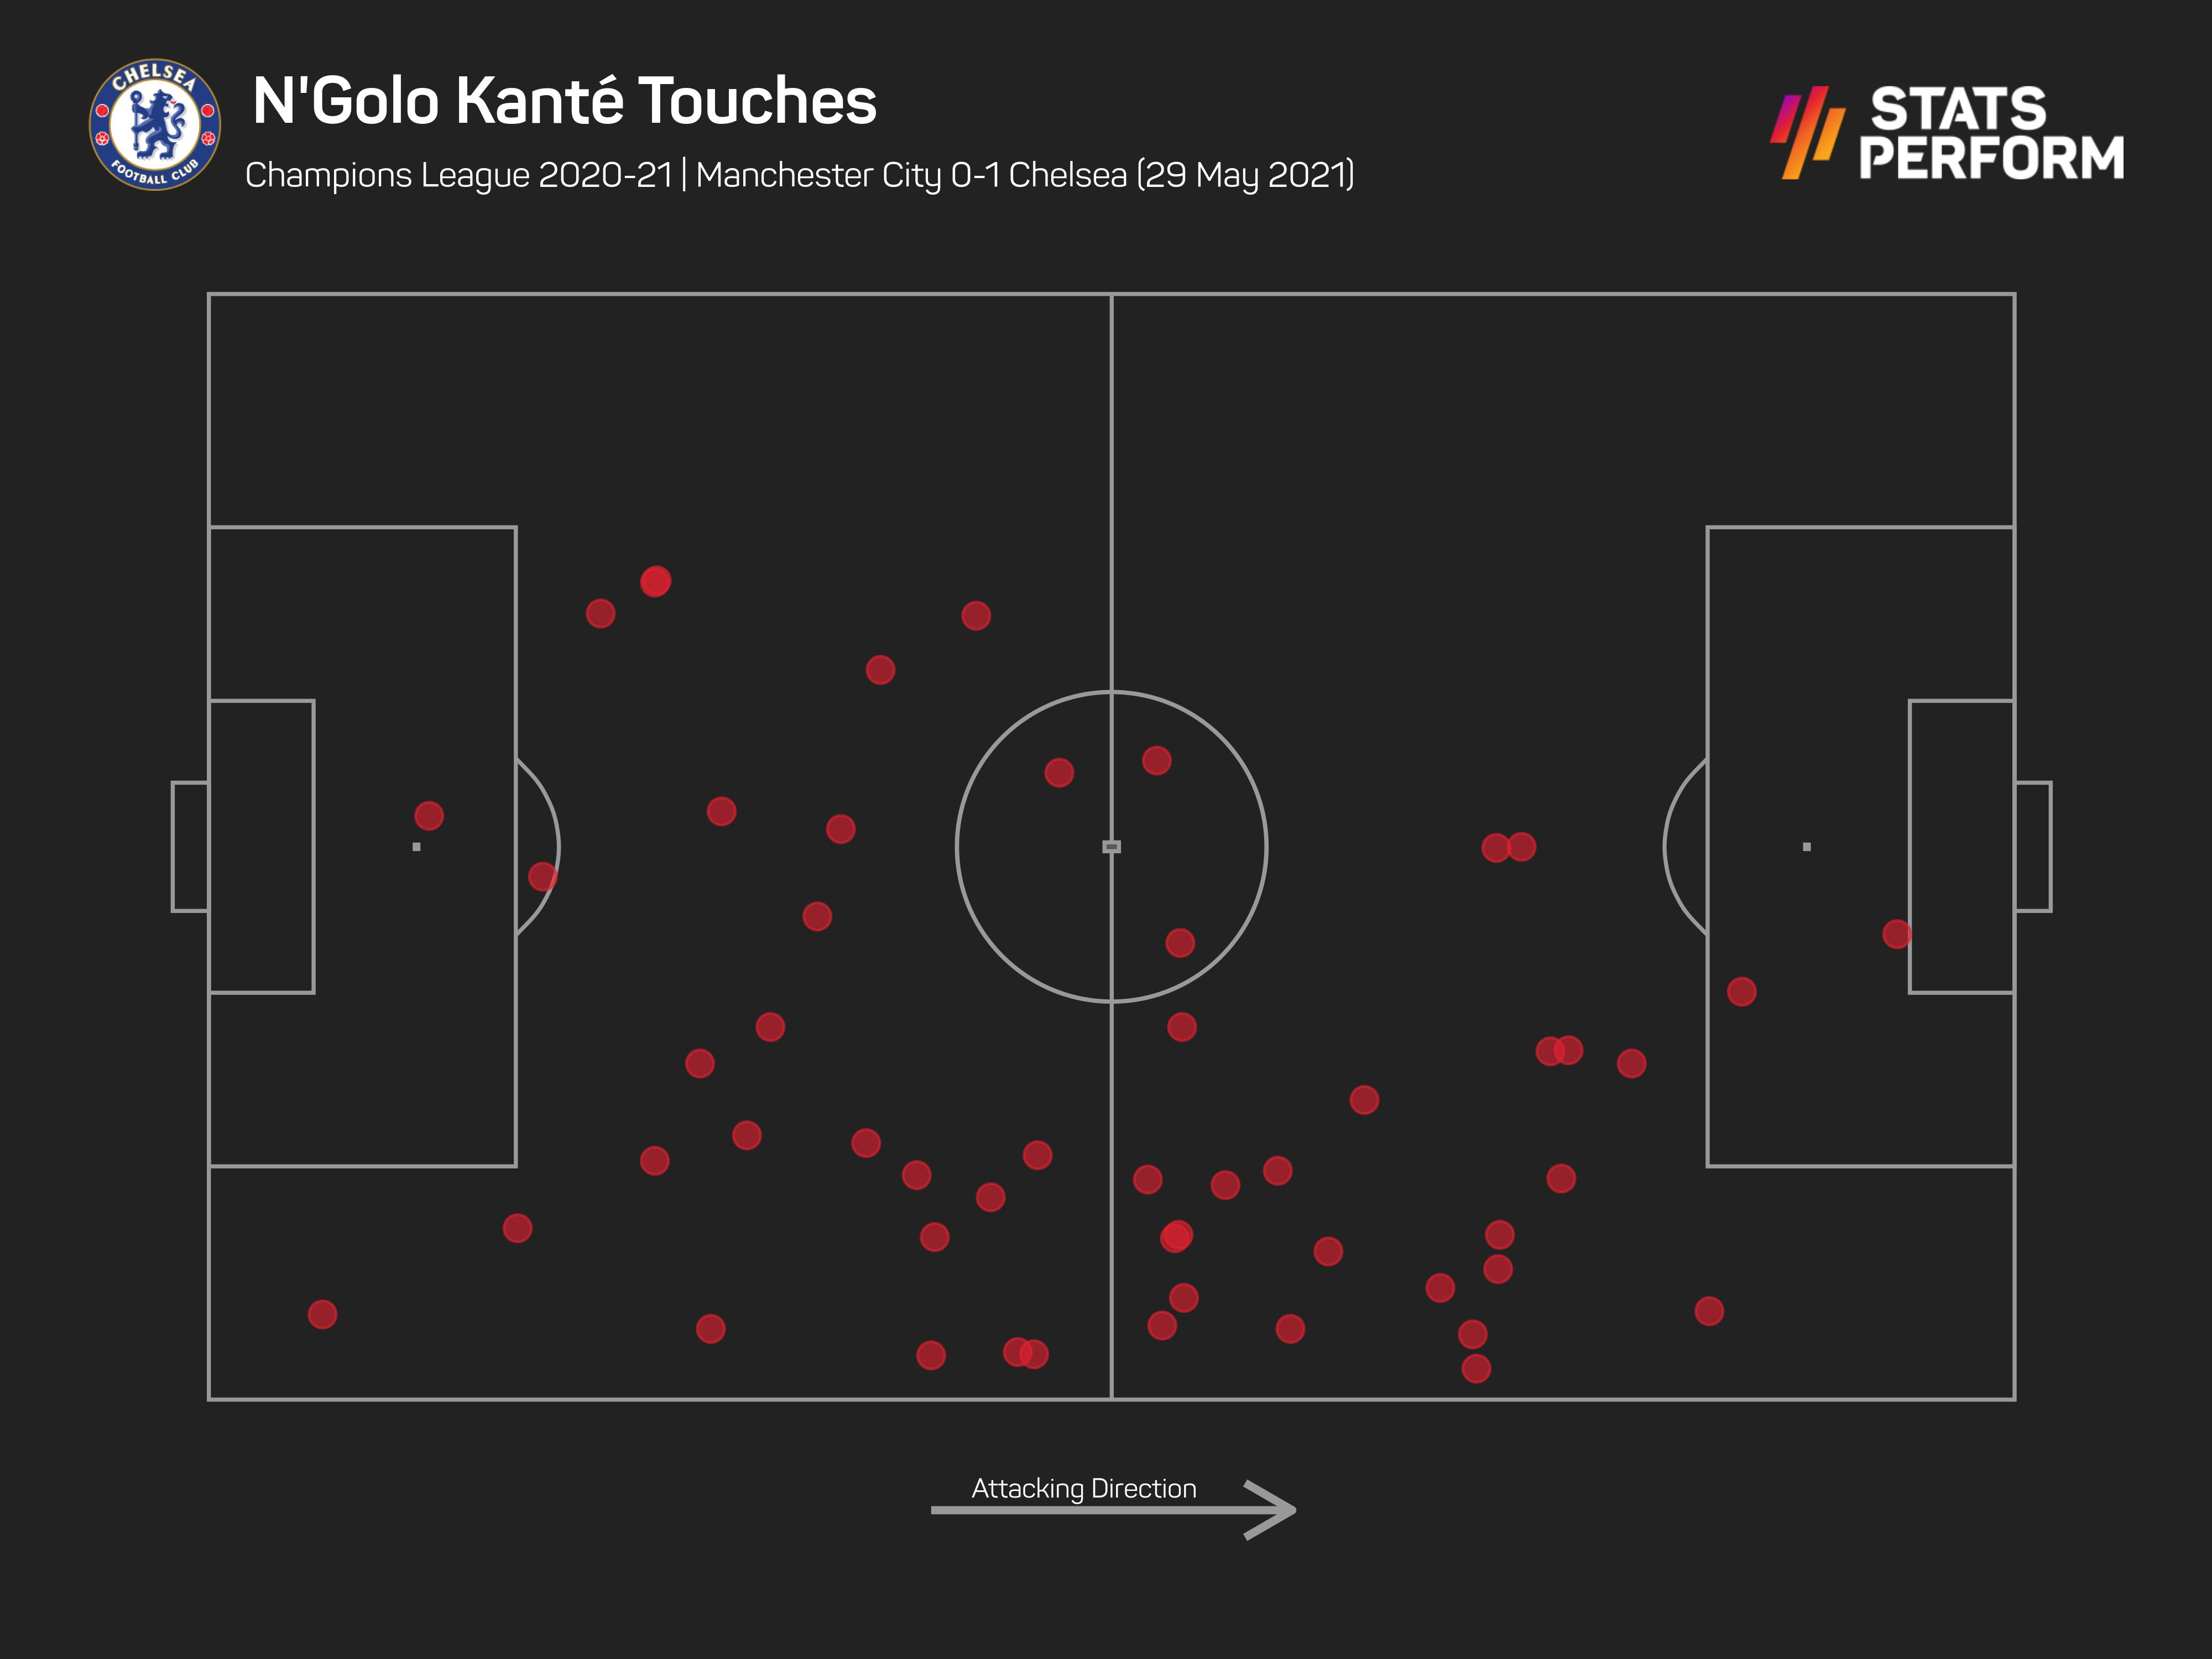 N'Golo Kante Champions League final touch map